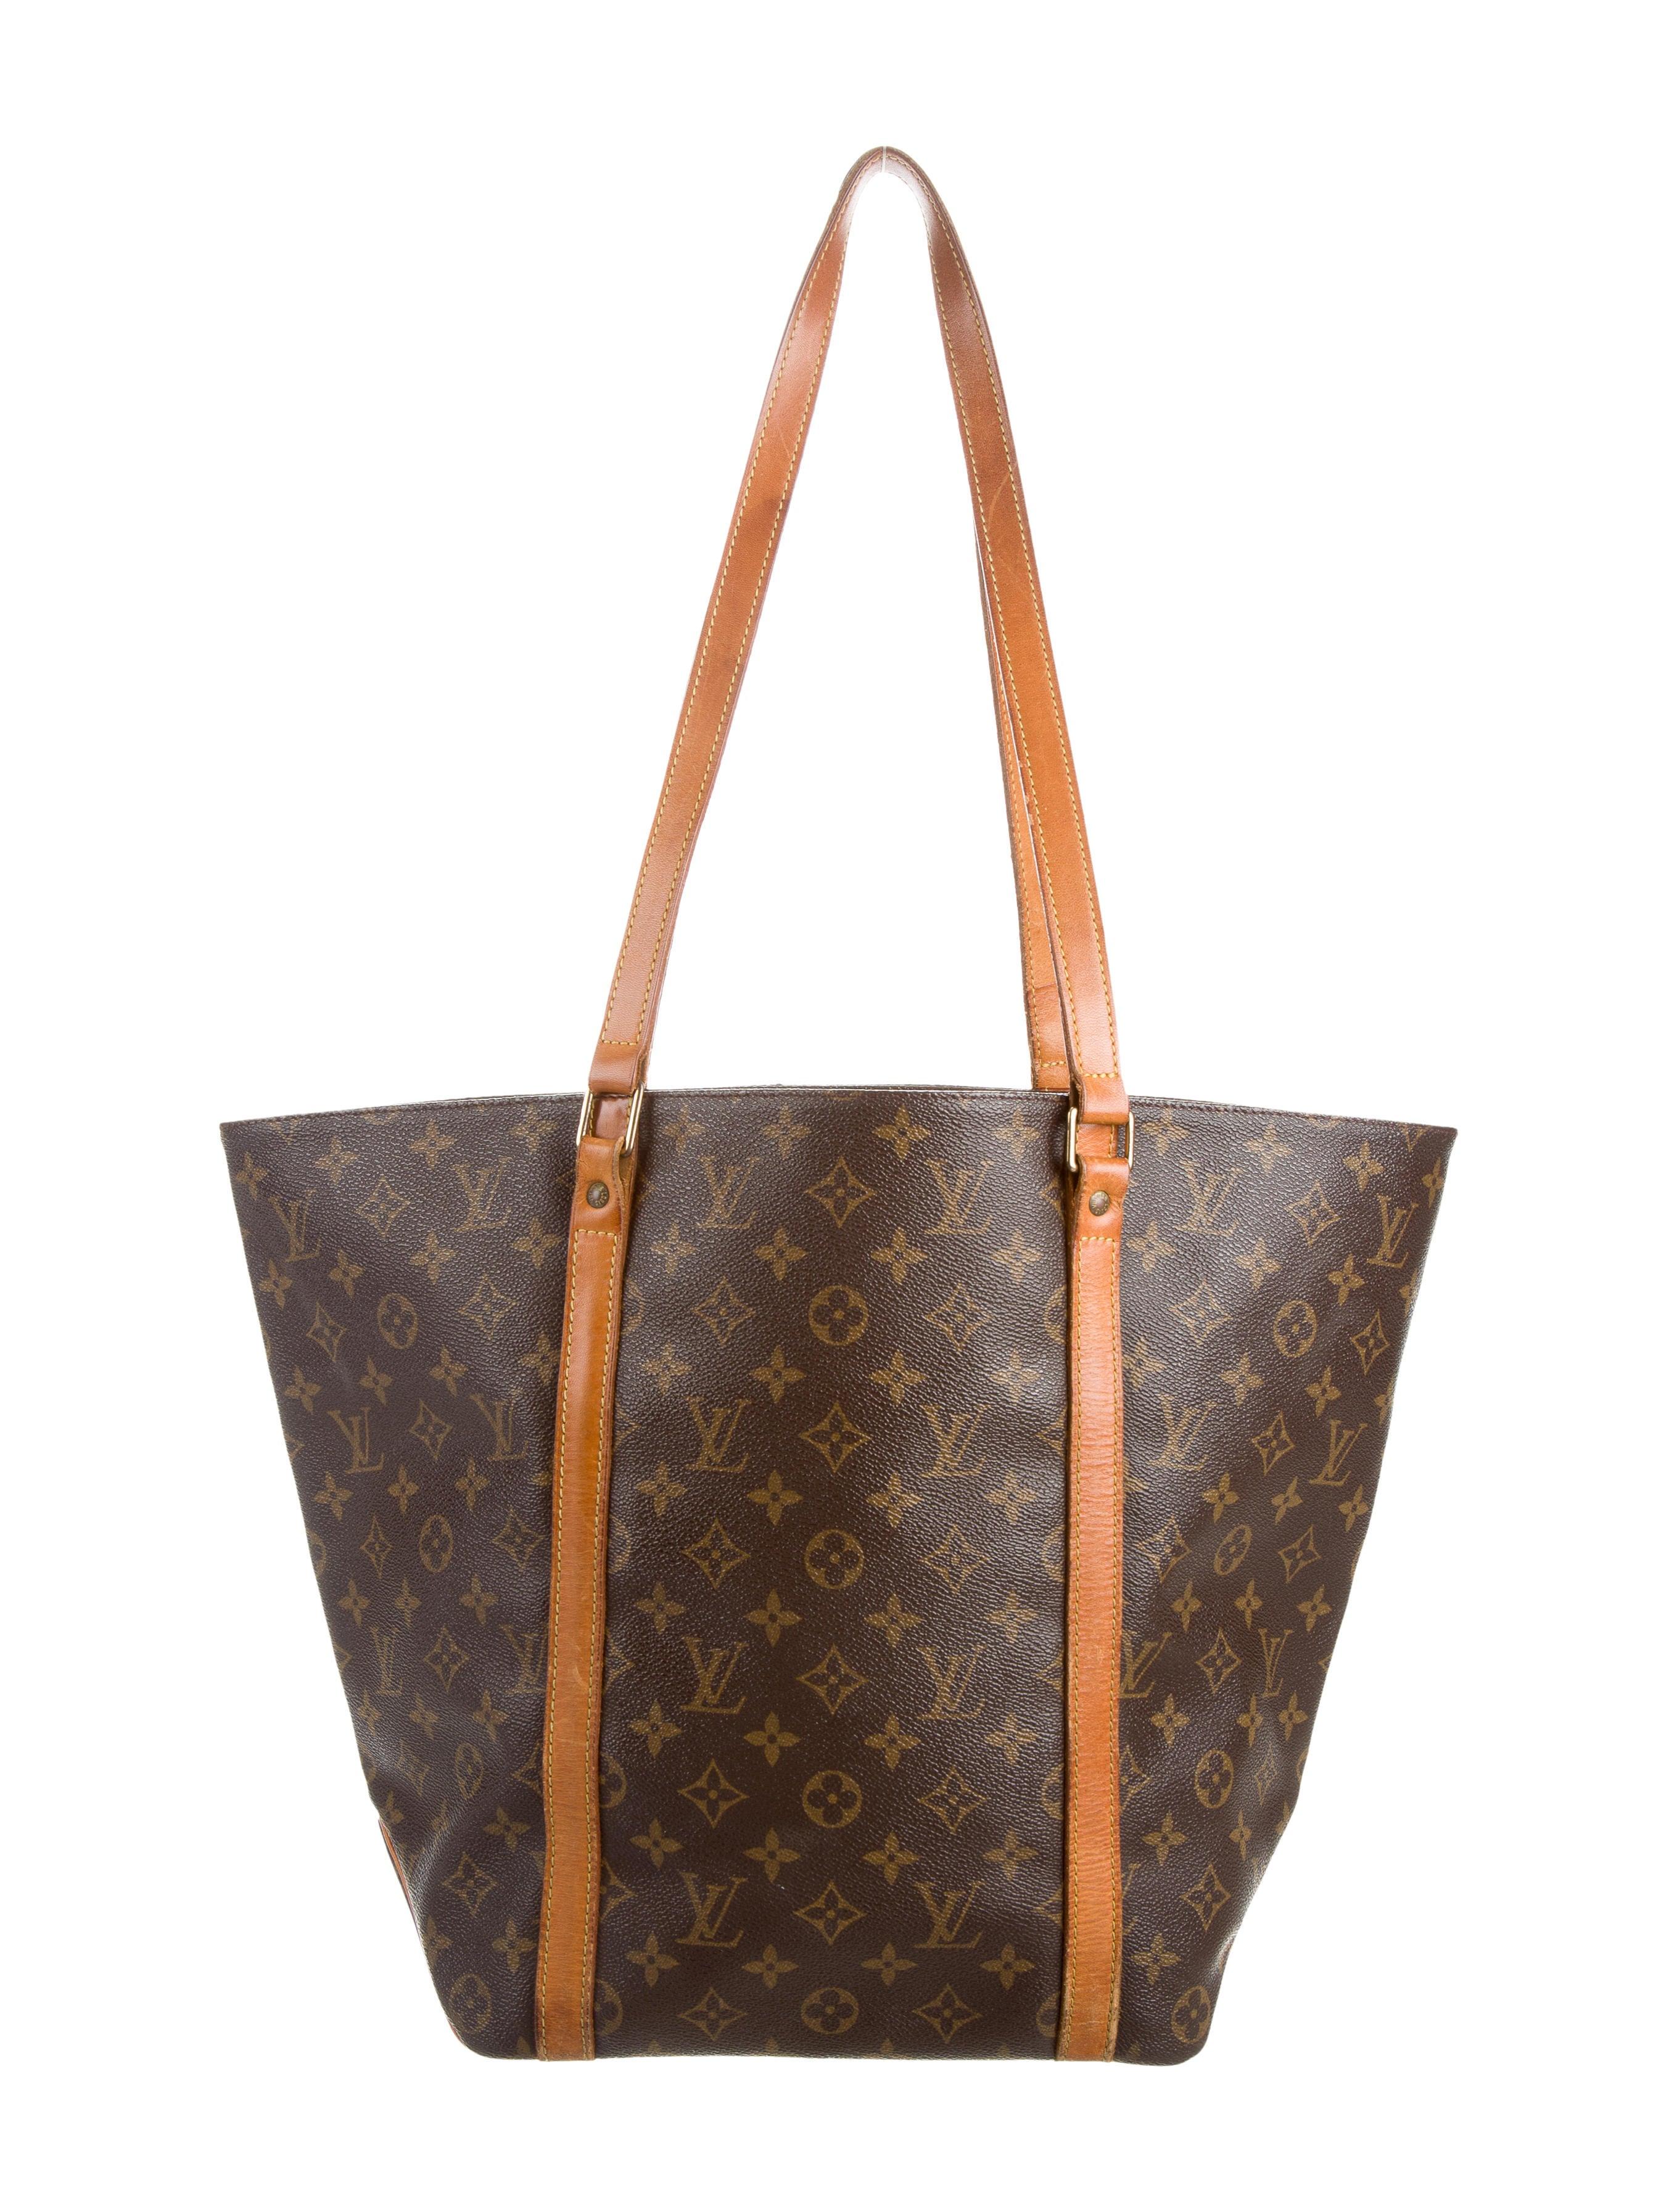 louis vuitton monogram sac shopping tote handbags. Black Bedroom Furniture Sets. Home Design Ideas